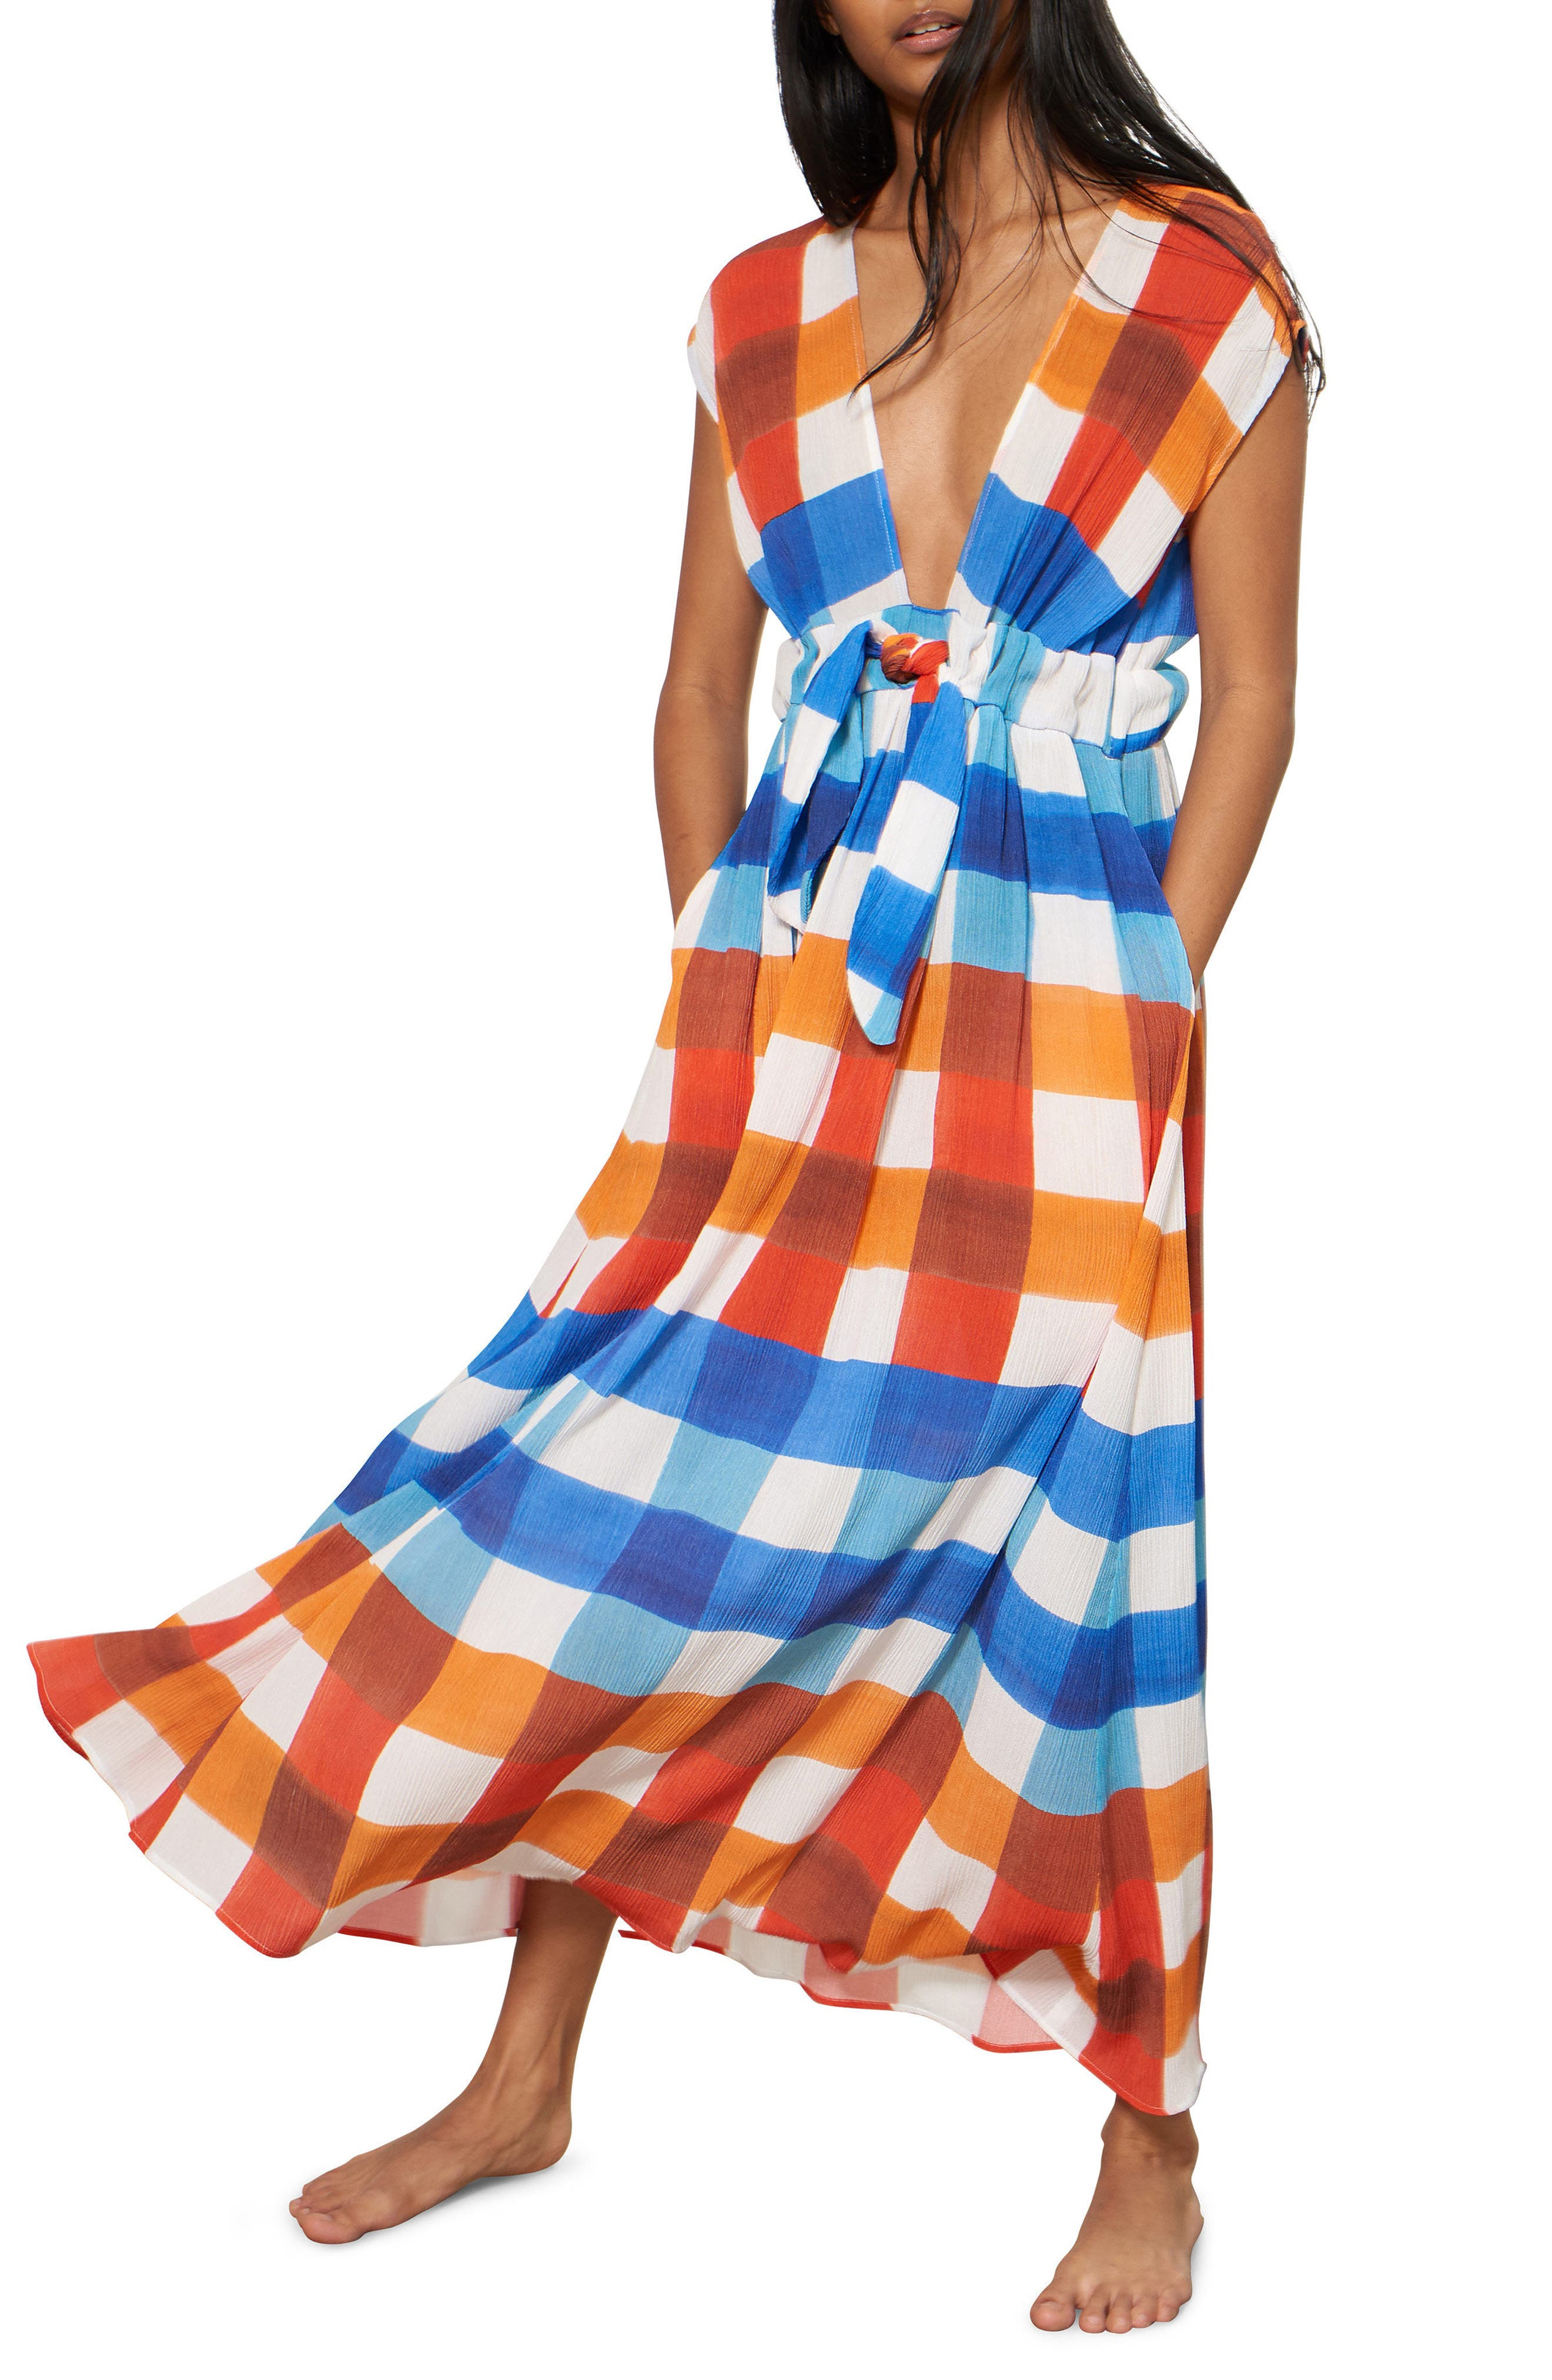 Katinka Check Cover-Up Maxi Dress,                         Main,                         color, RED/ BLUE MULTI